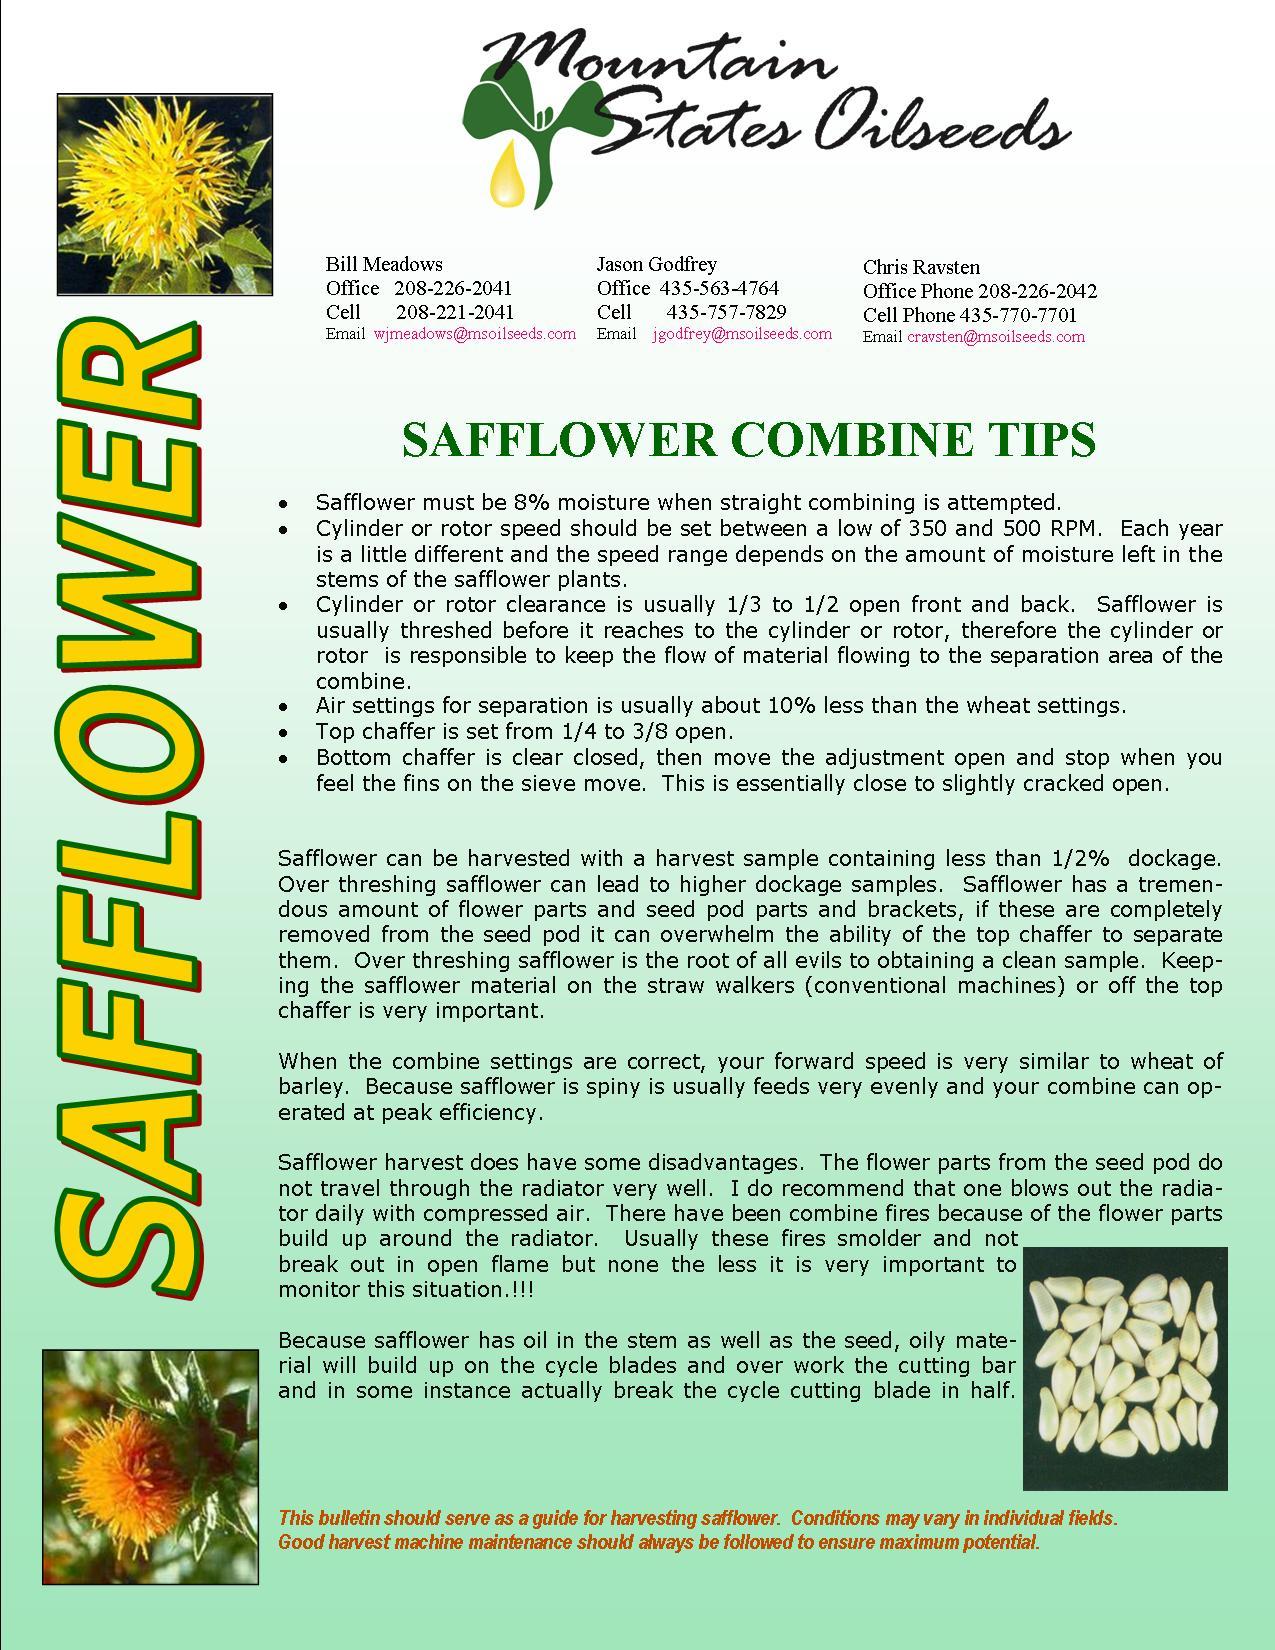 2014 SAFFLOWER COMBINE TIPS.jpg